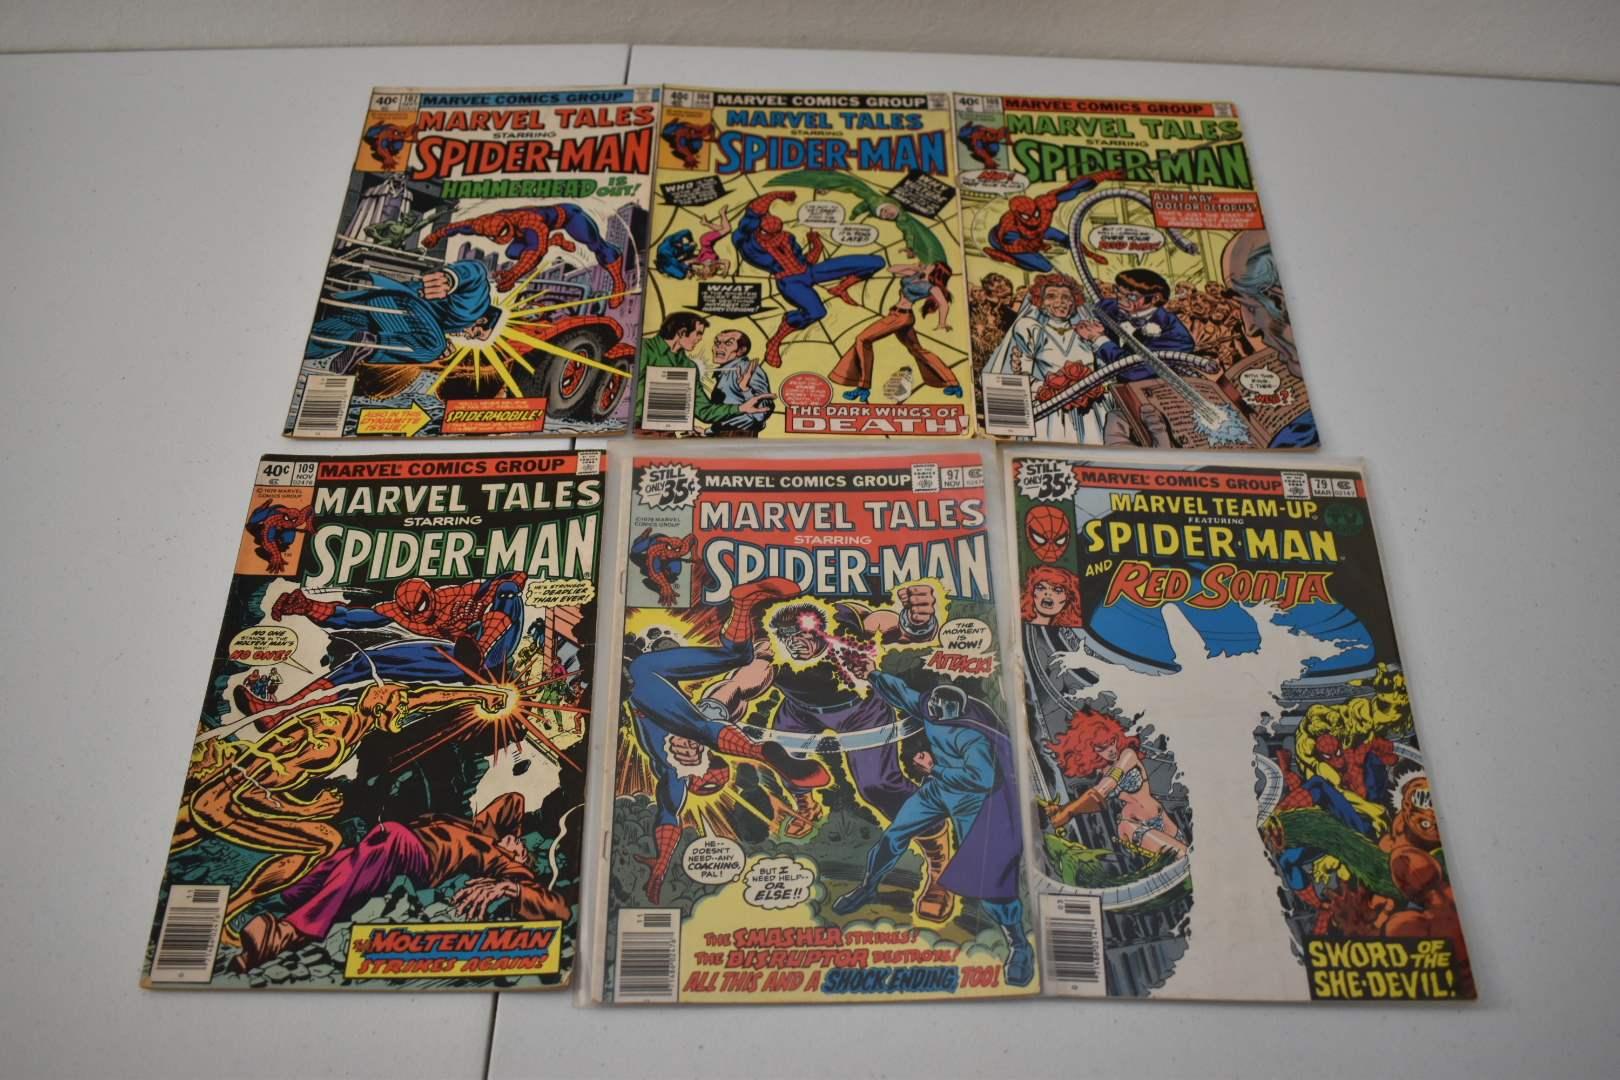 1970's Spiderman Comics